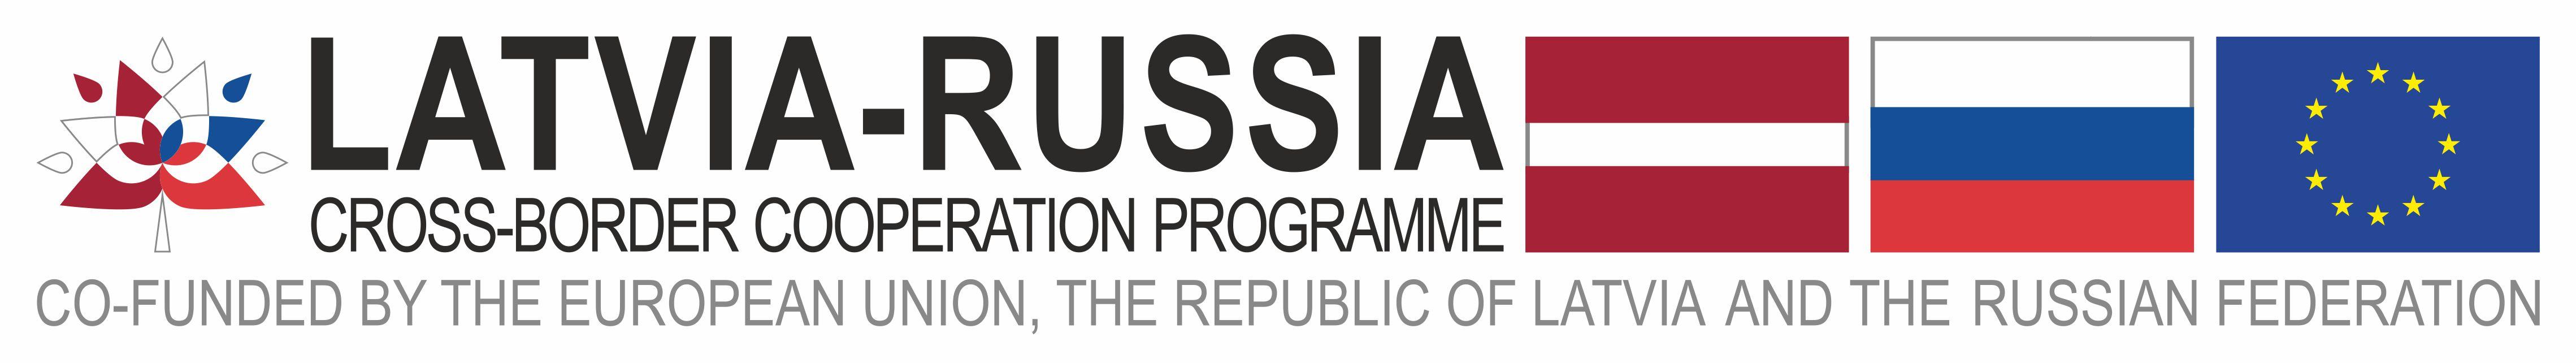 http://latruscbc.eu/wp-content/uploads/2016/12/LatRus_horizontal_extented_cmyk.jpg